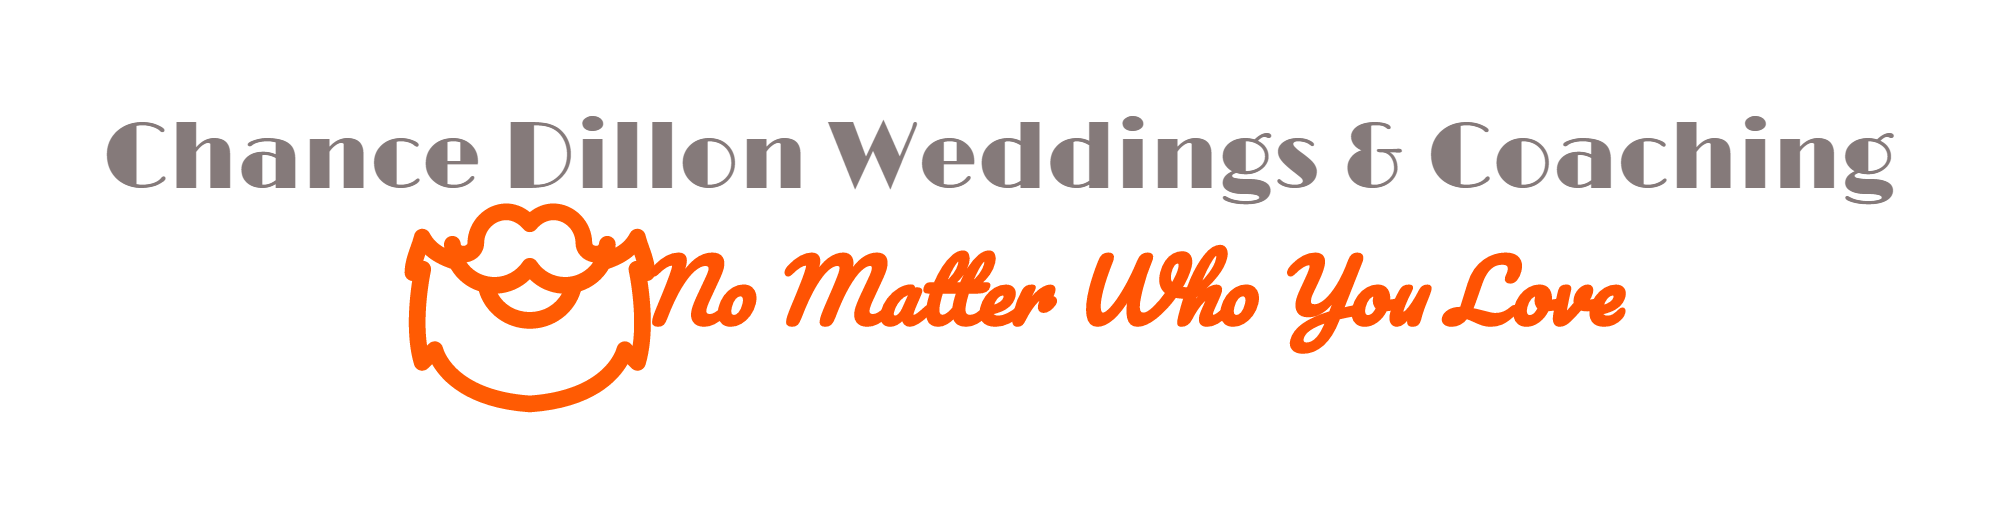 Chance Dillon Weddings & Coaching-logo (1).png